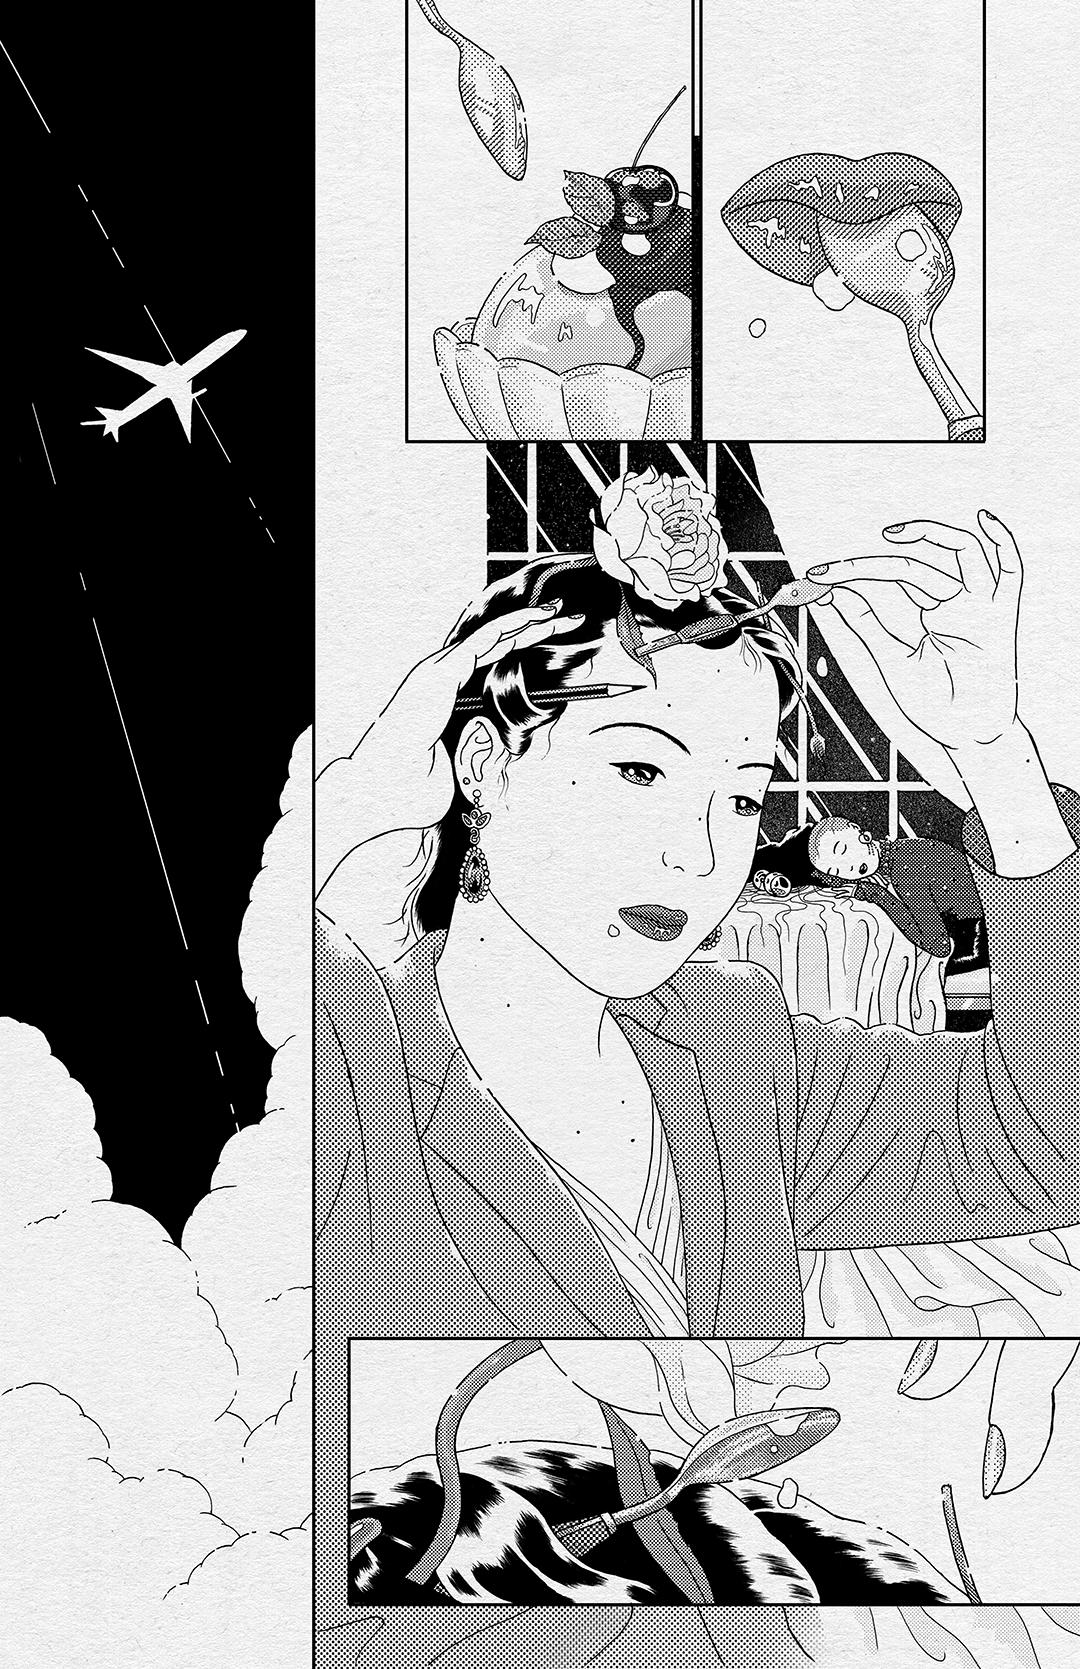 GirlsclubAsia-Illustrator-choisungmin_008